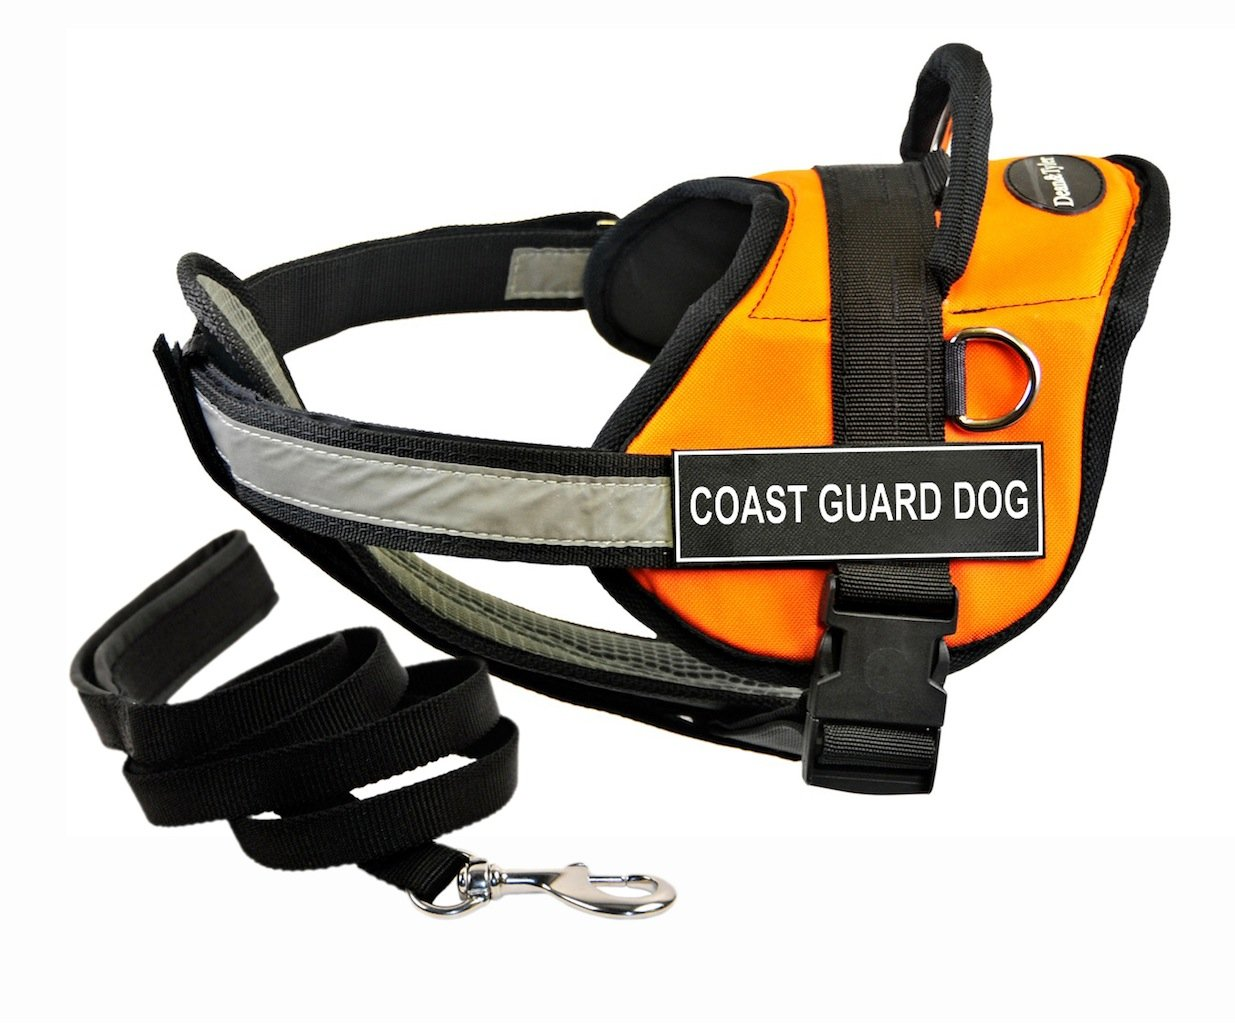 online economico Dean & Tyler DT Works arancia arancia arancia Coast Guard Dog Torace Imbracatura con Imbottitura, Grande e Nero 1,8 m Padded Puppy guinzaglio.  best-seller